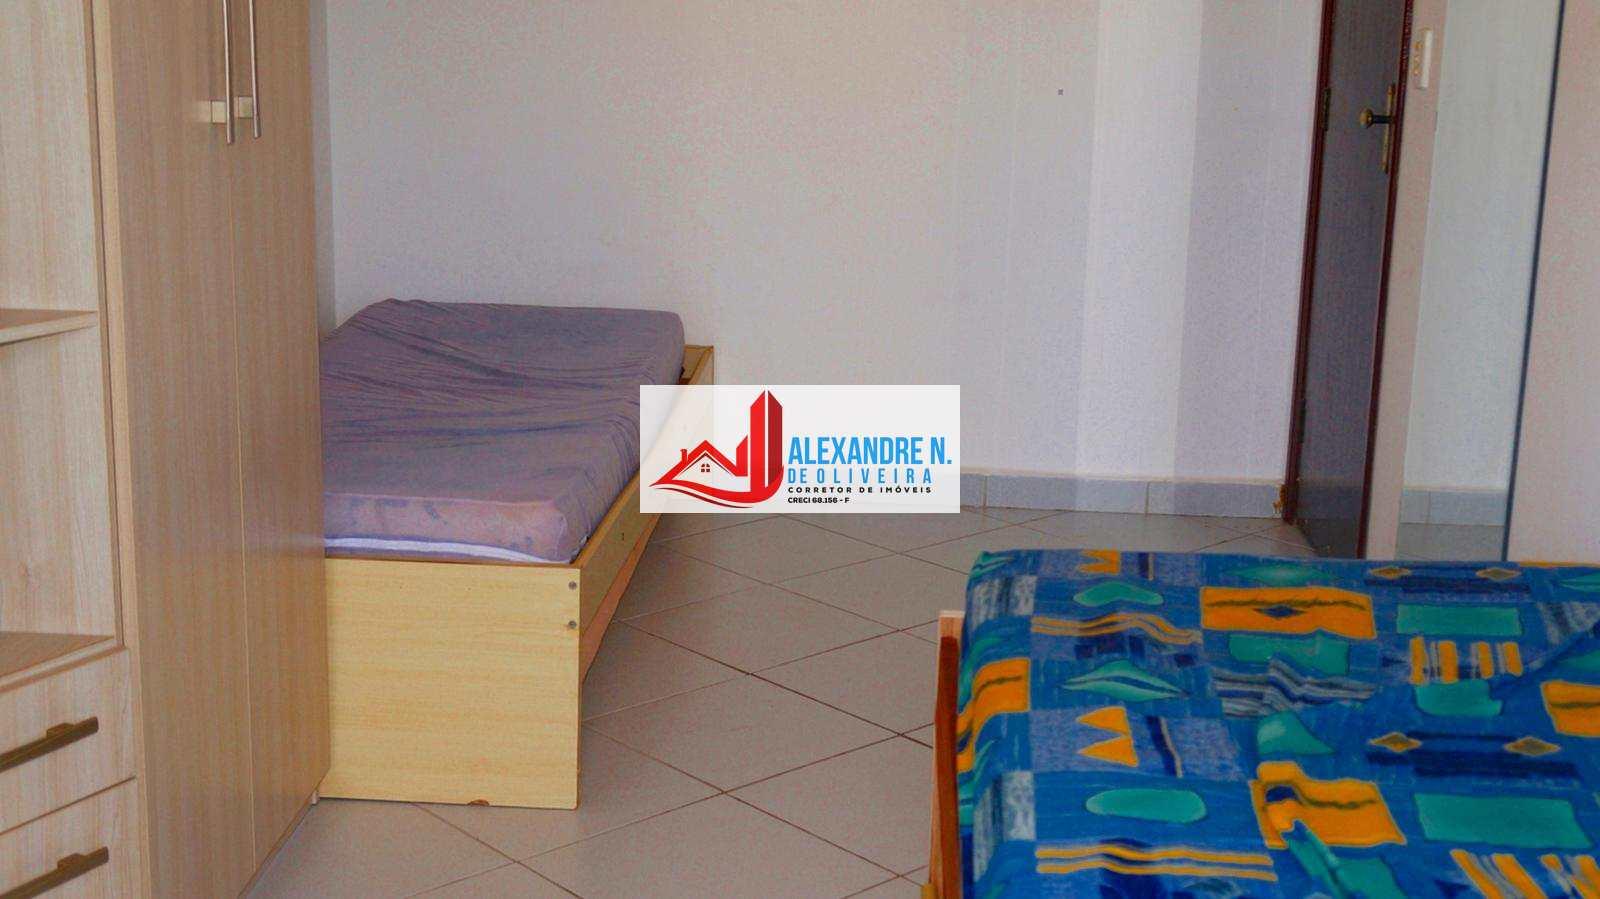 Apto 1 dorm, completo, Ocian, Praia Grande, R$ 160 mil, AP00600